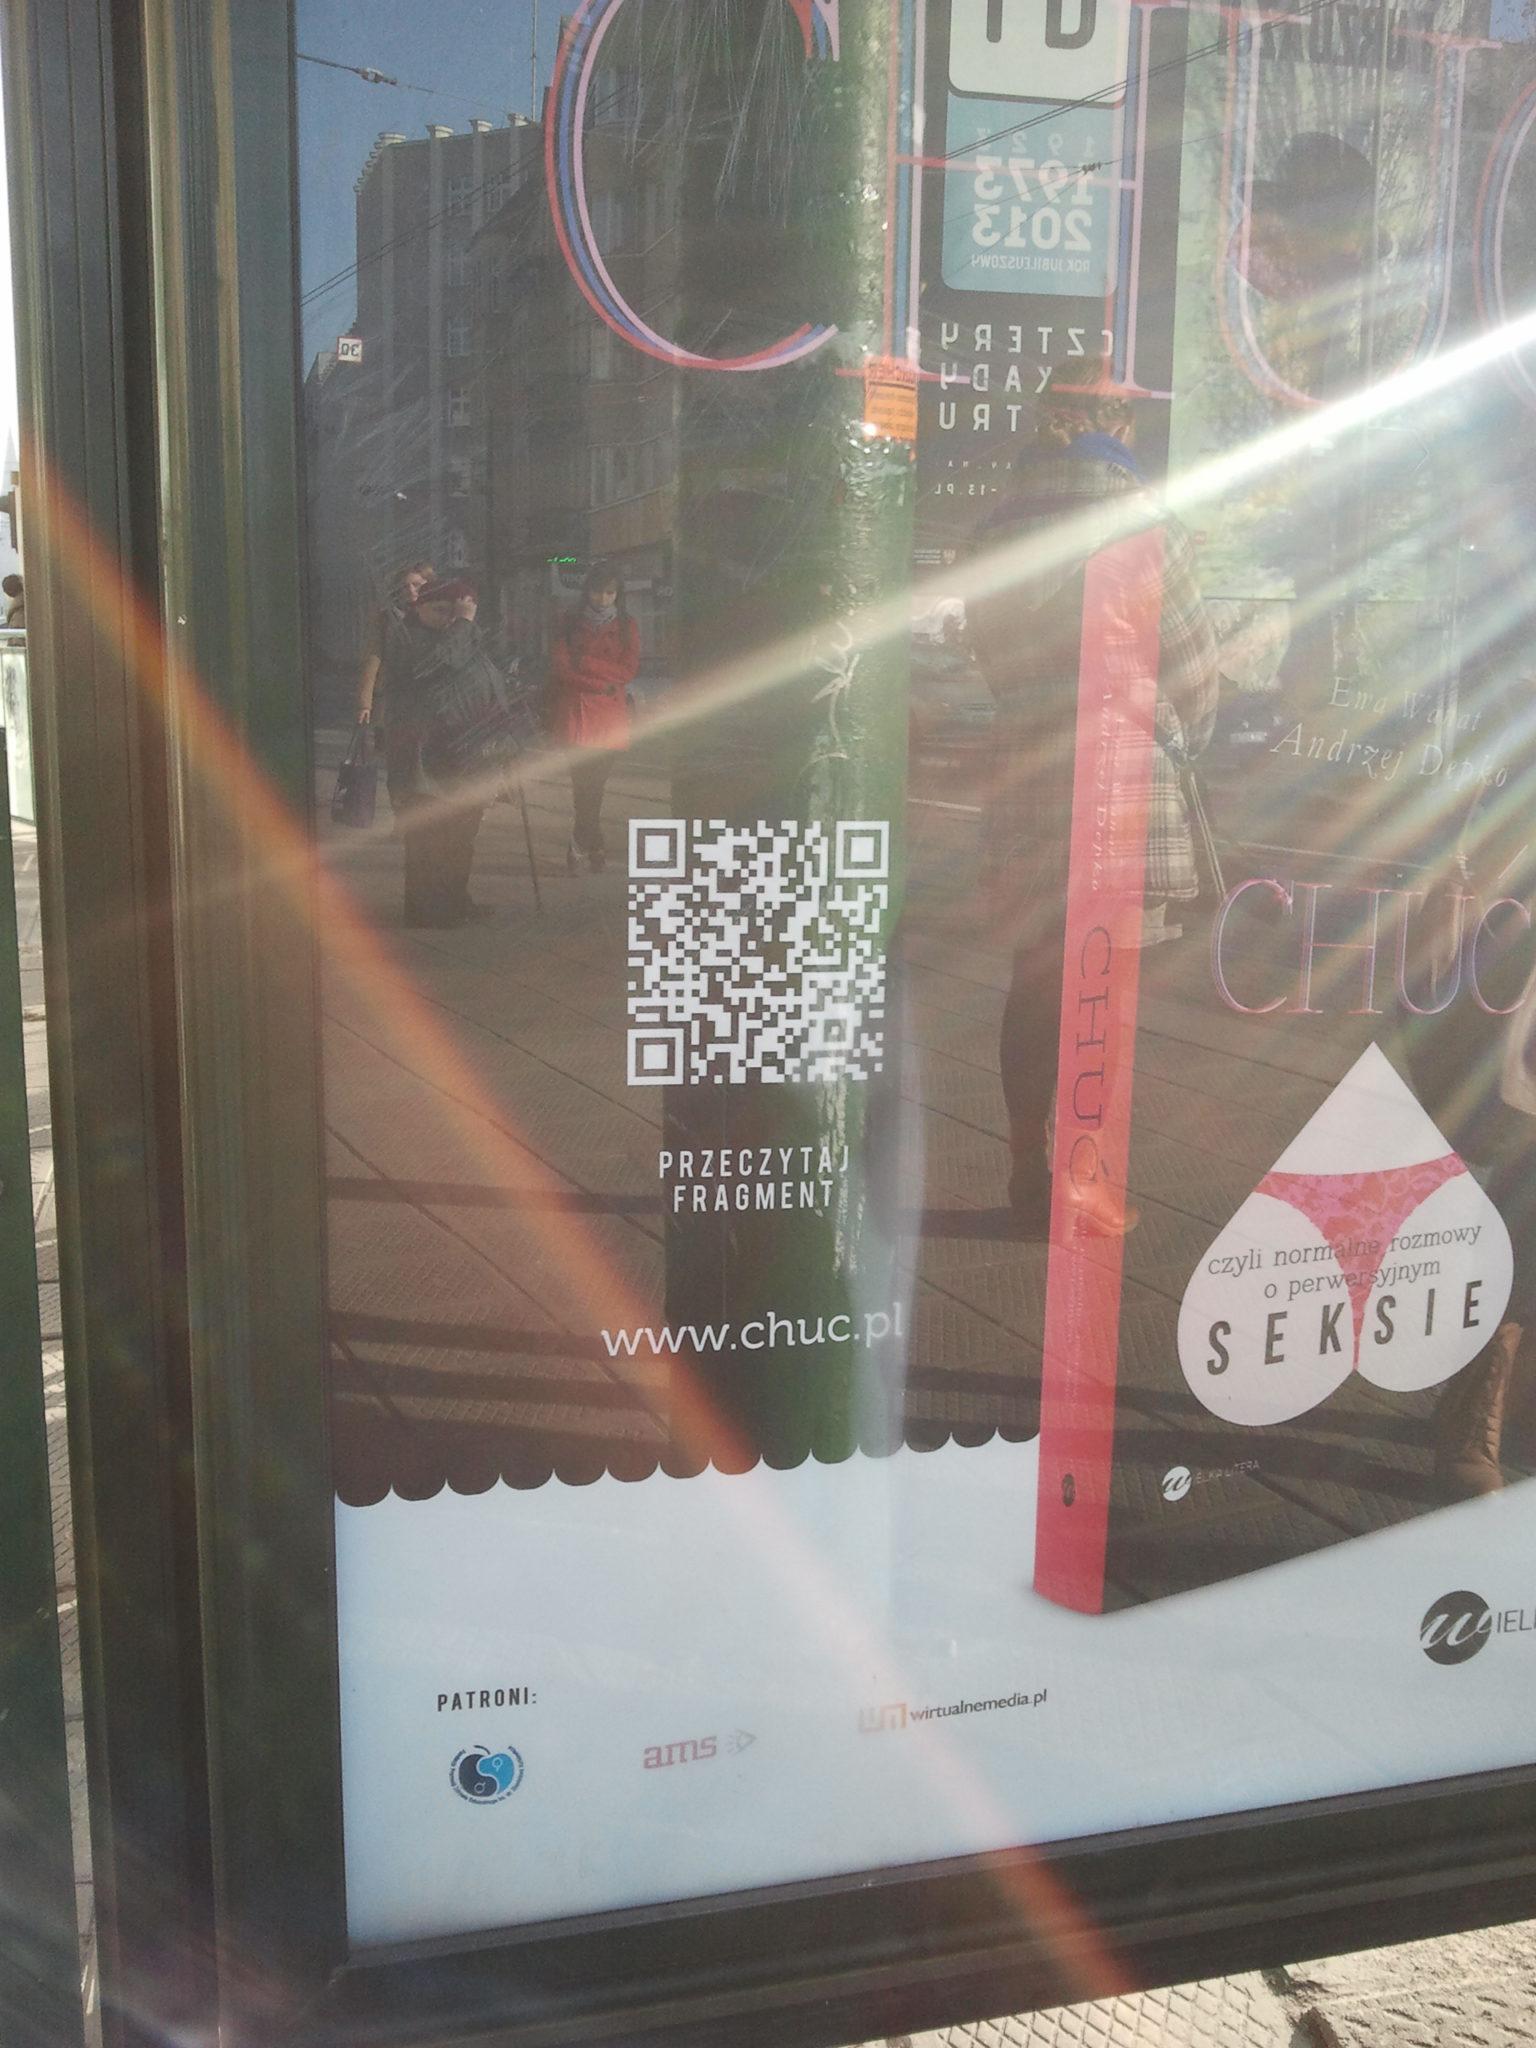 QR code Citylight 1